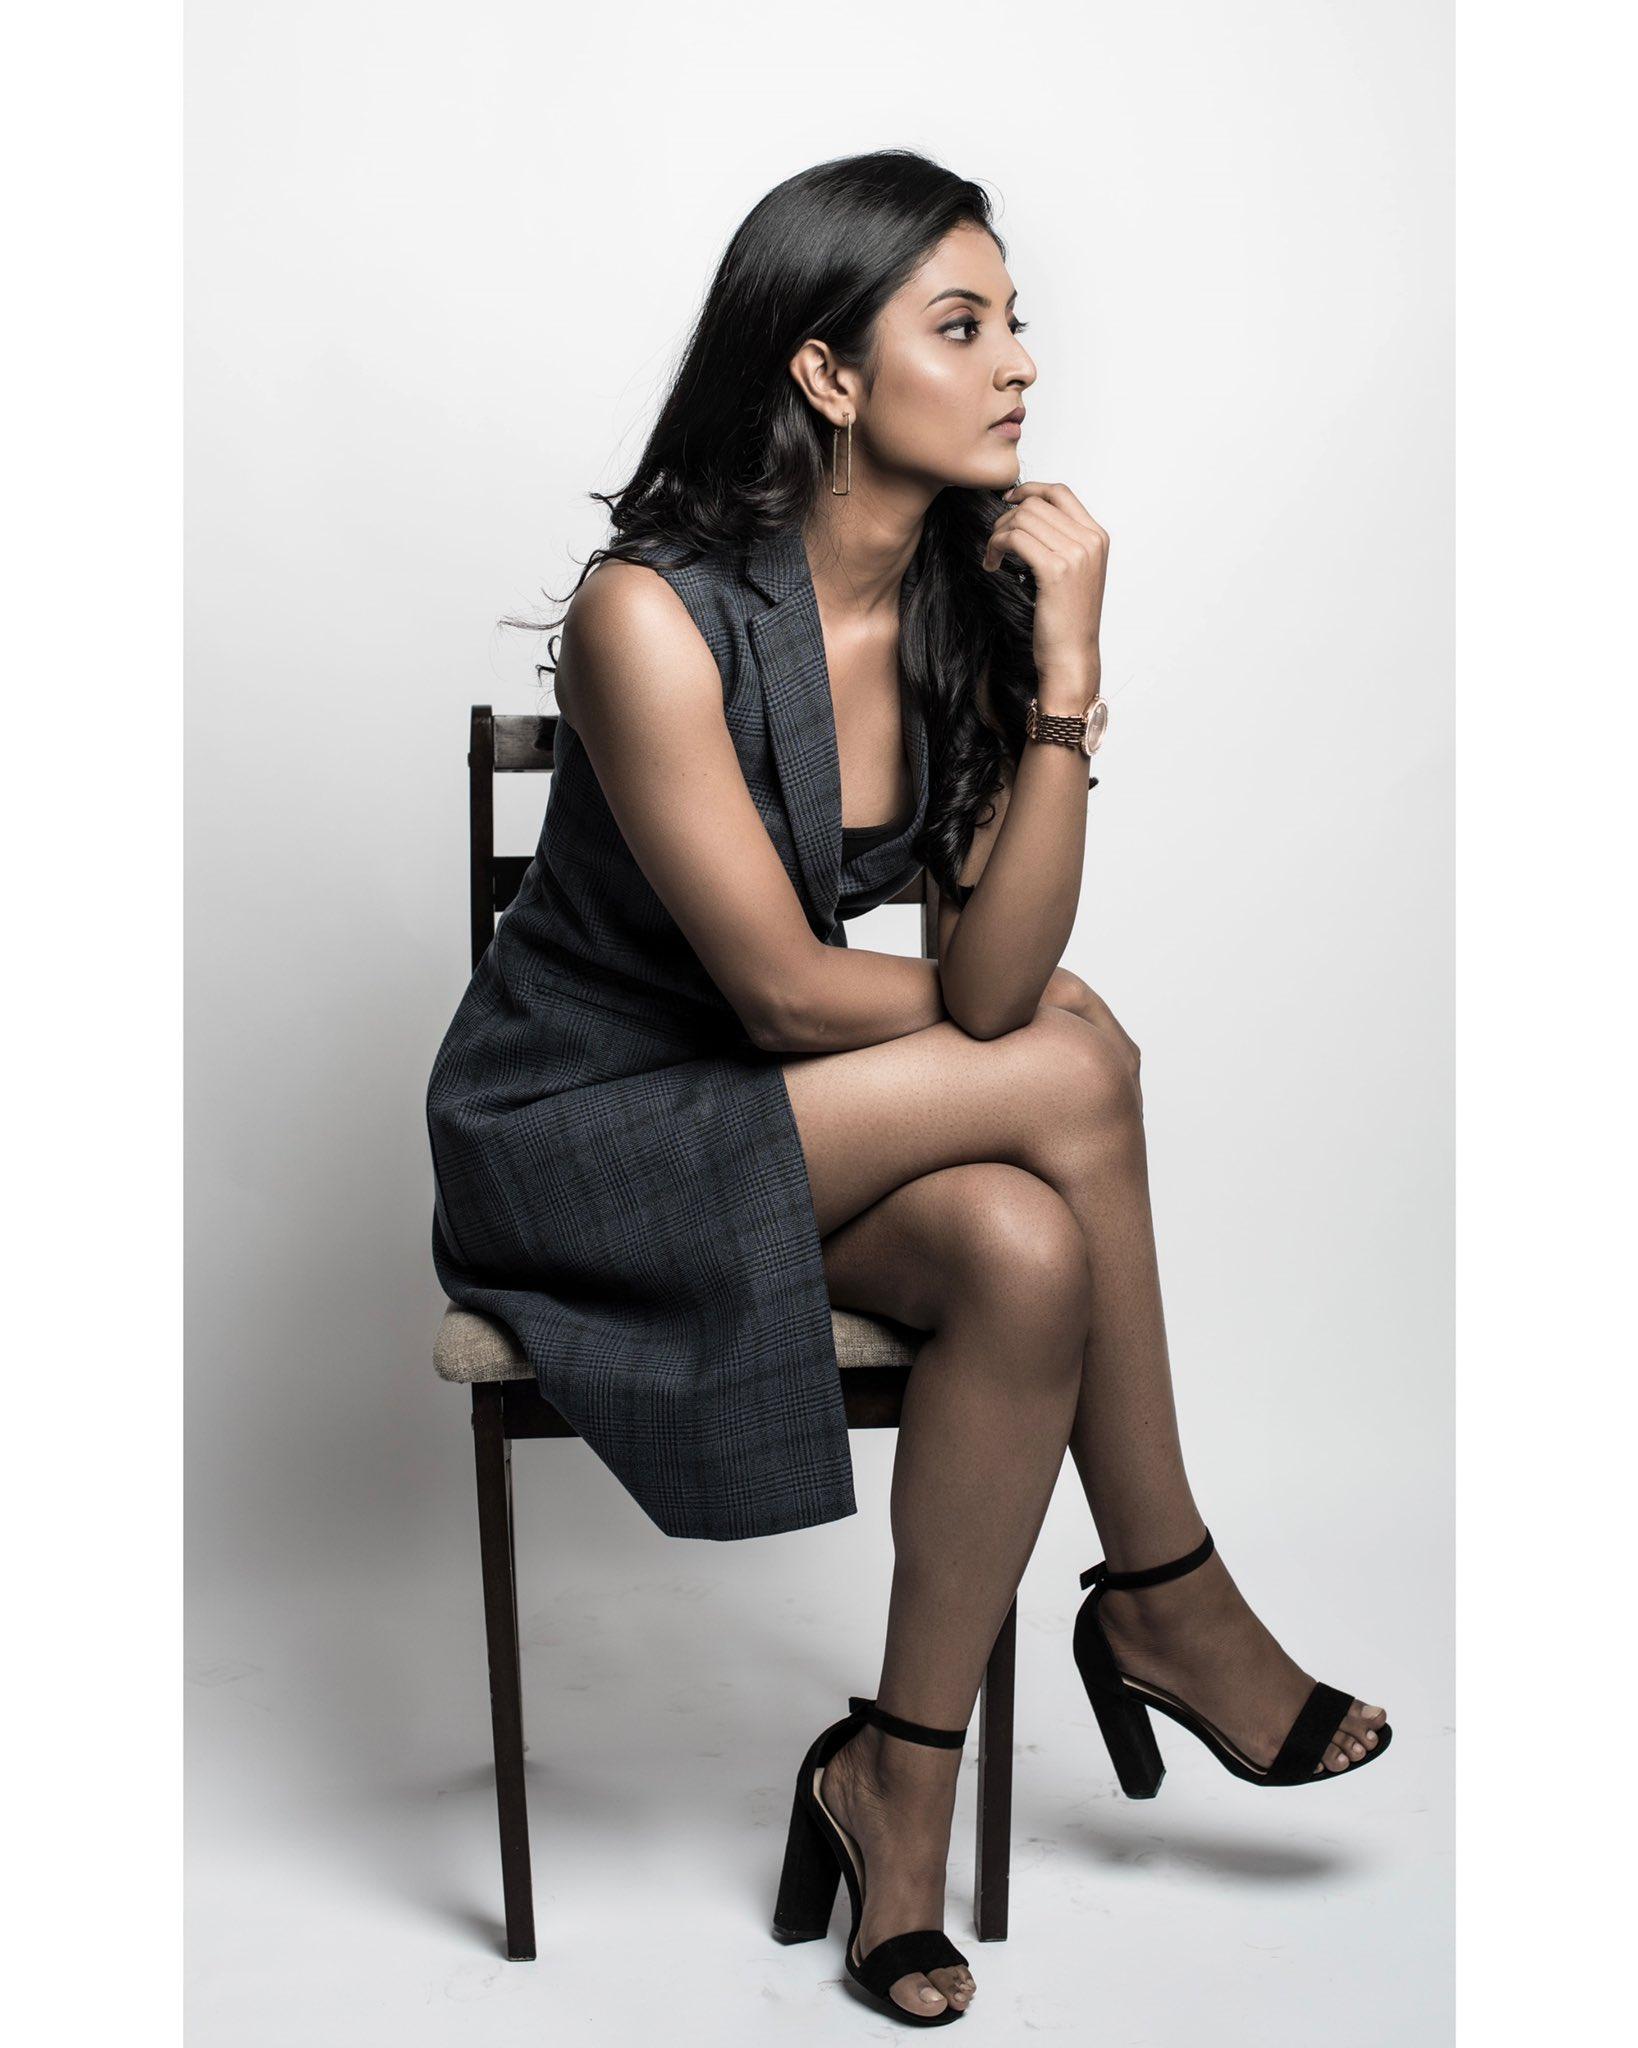 Tamil Actress Nivedhithaa Sathish New Photos (16)